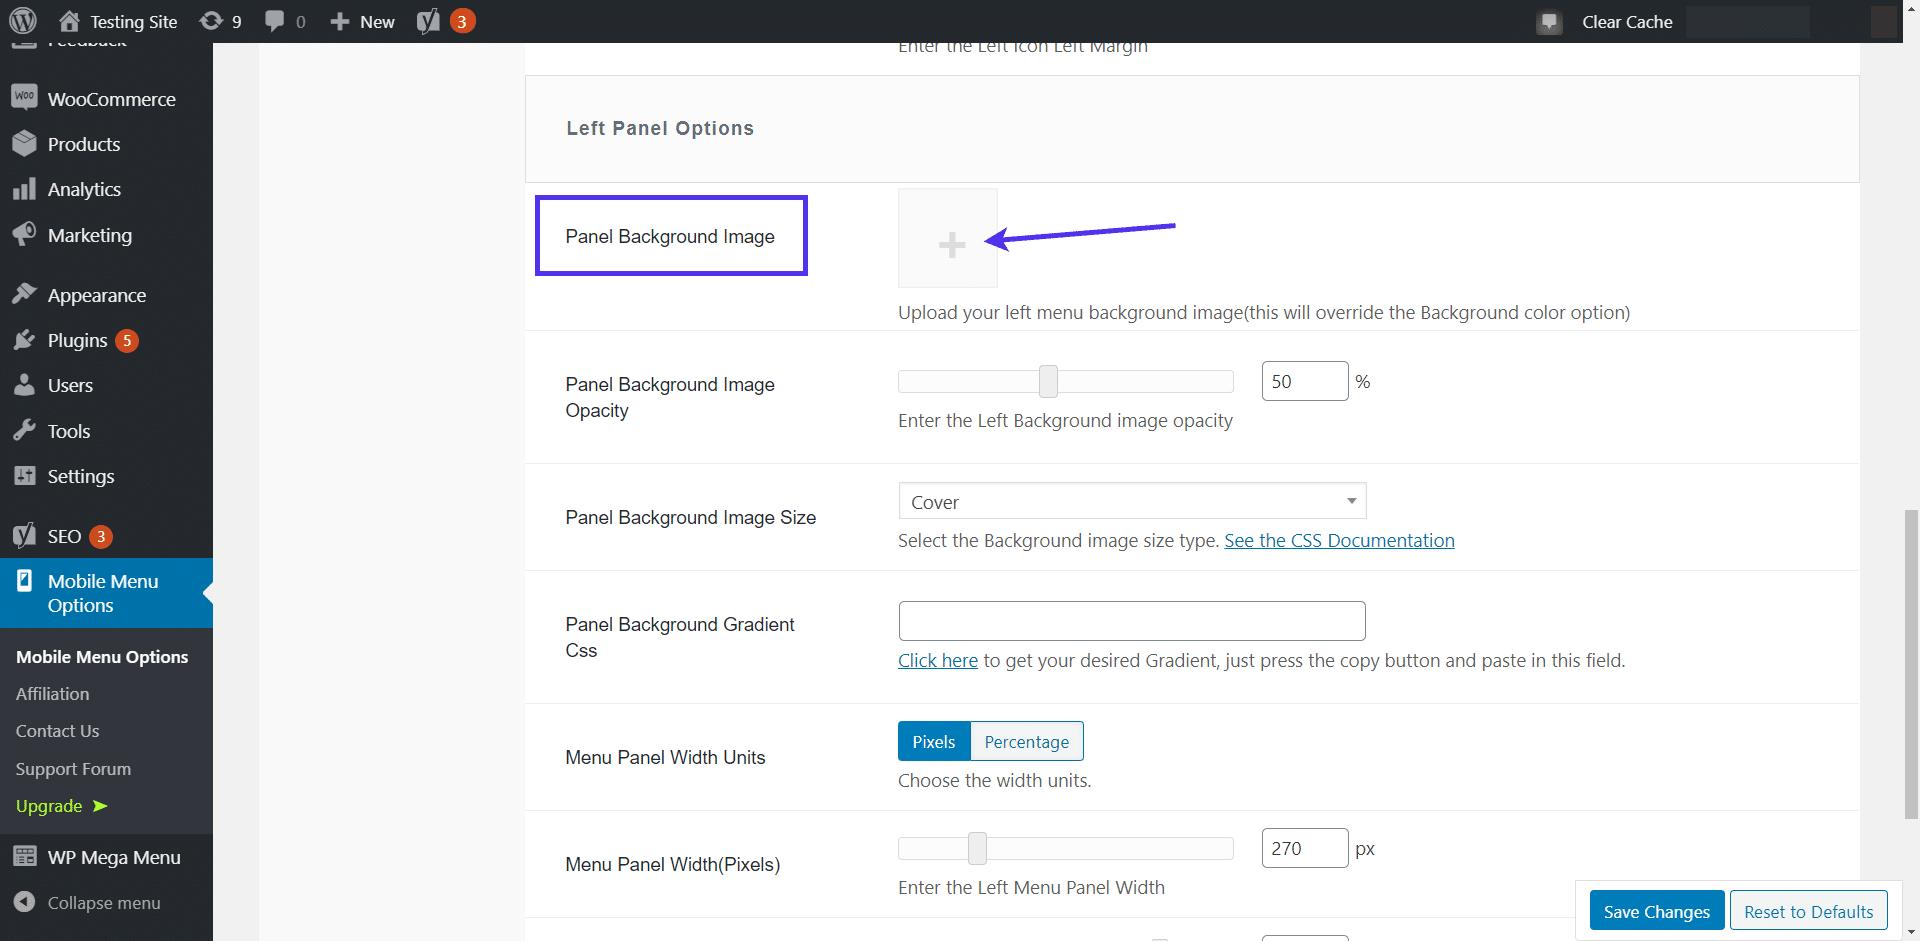 Adding a mobile menu background image